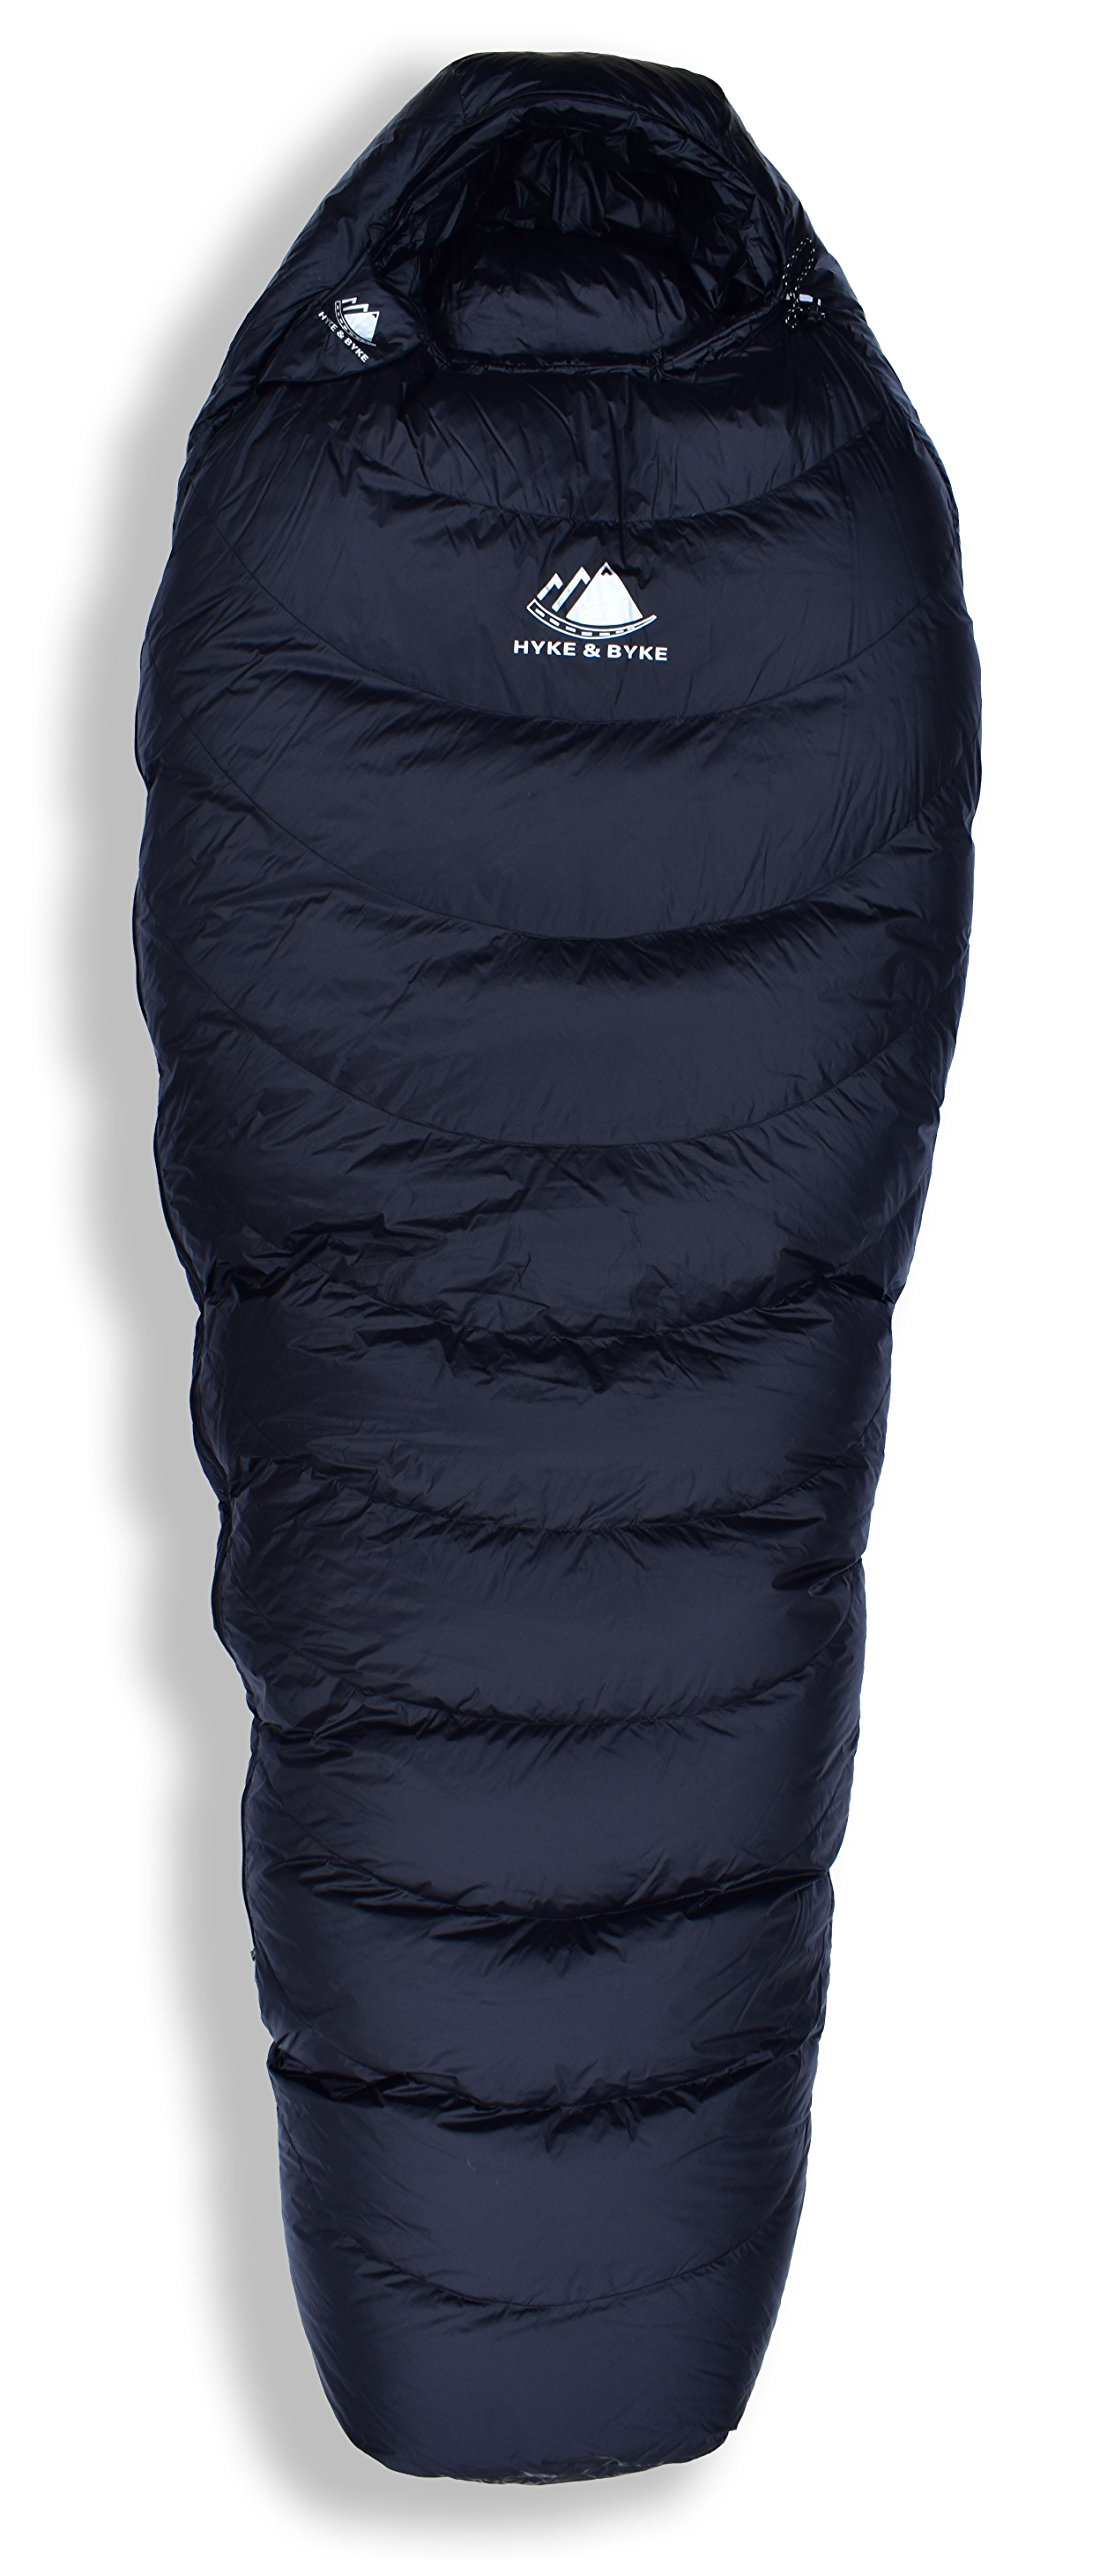 Hyke & Byke Quandary 15 Degree F 650 Fill Power Hydrophobic Down Sleeping Bag with ClusterLoft Base - Ultra Lightweight 3 Season Men's and Women's Mummy Bag Designed for Backpacking 4